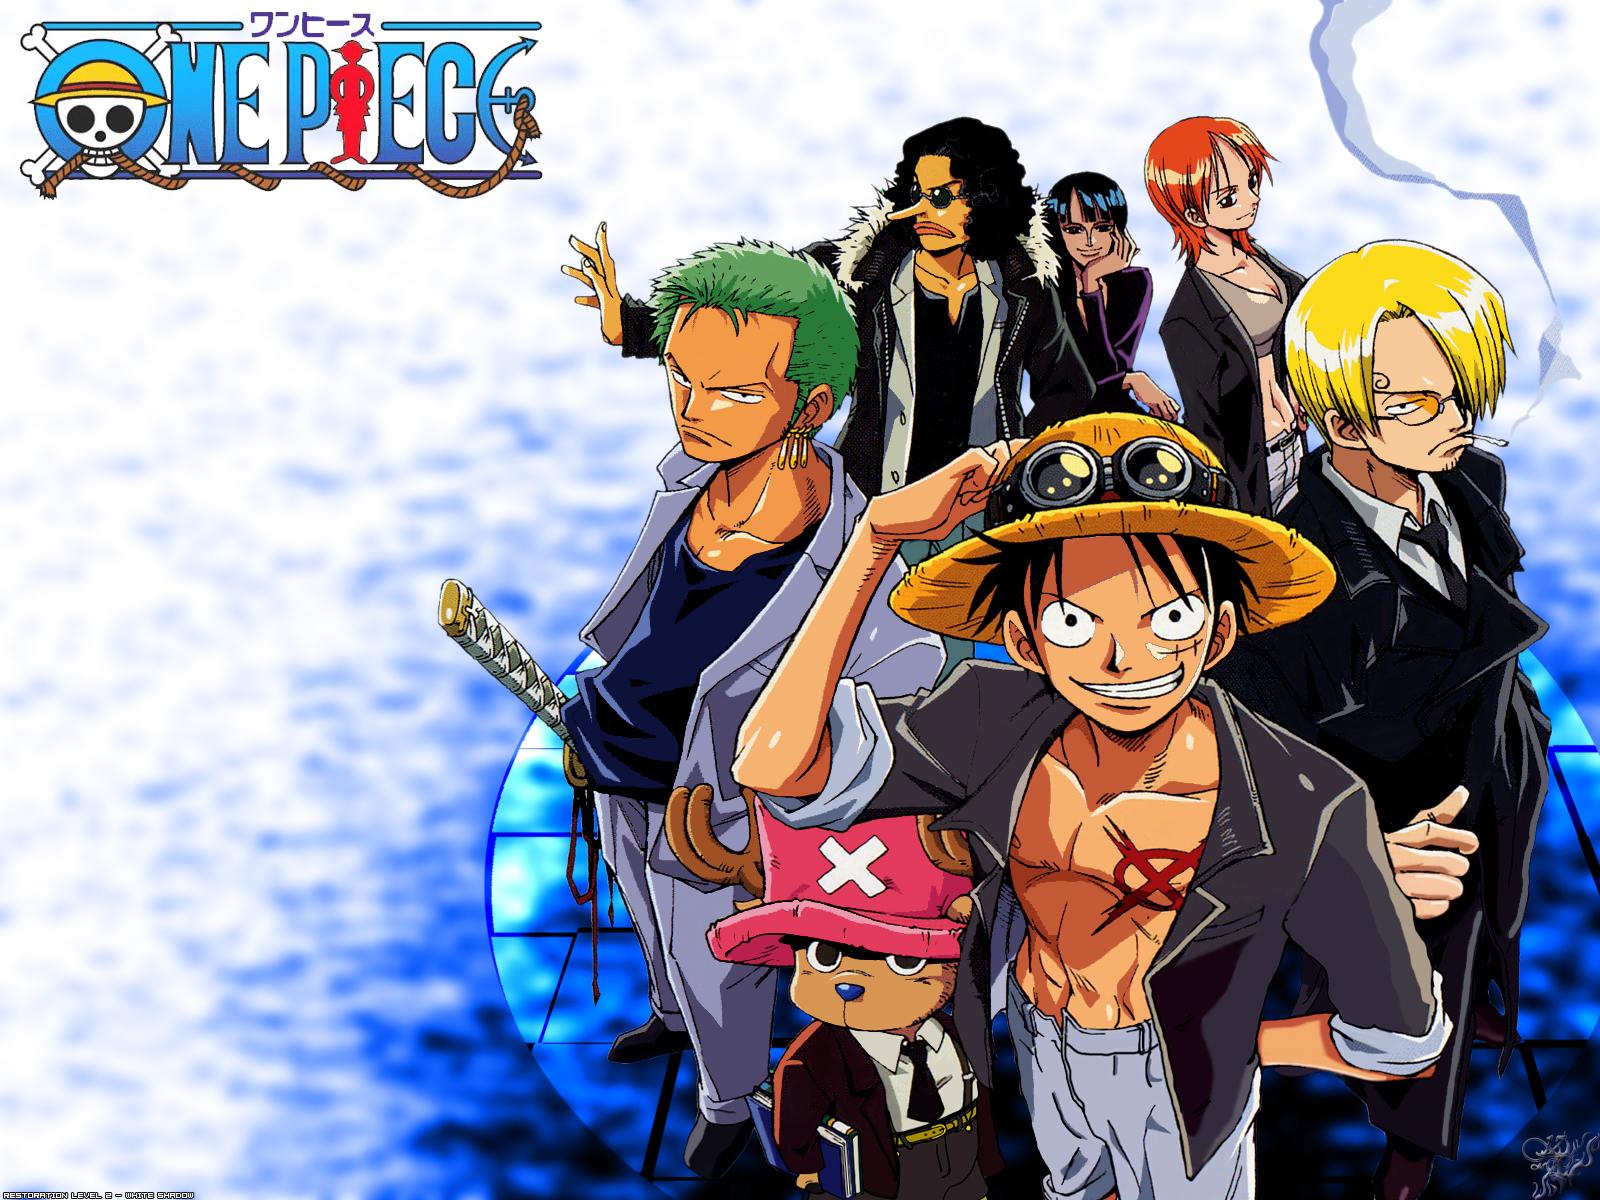 One Piece wallpaper hd 1600x1200